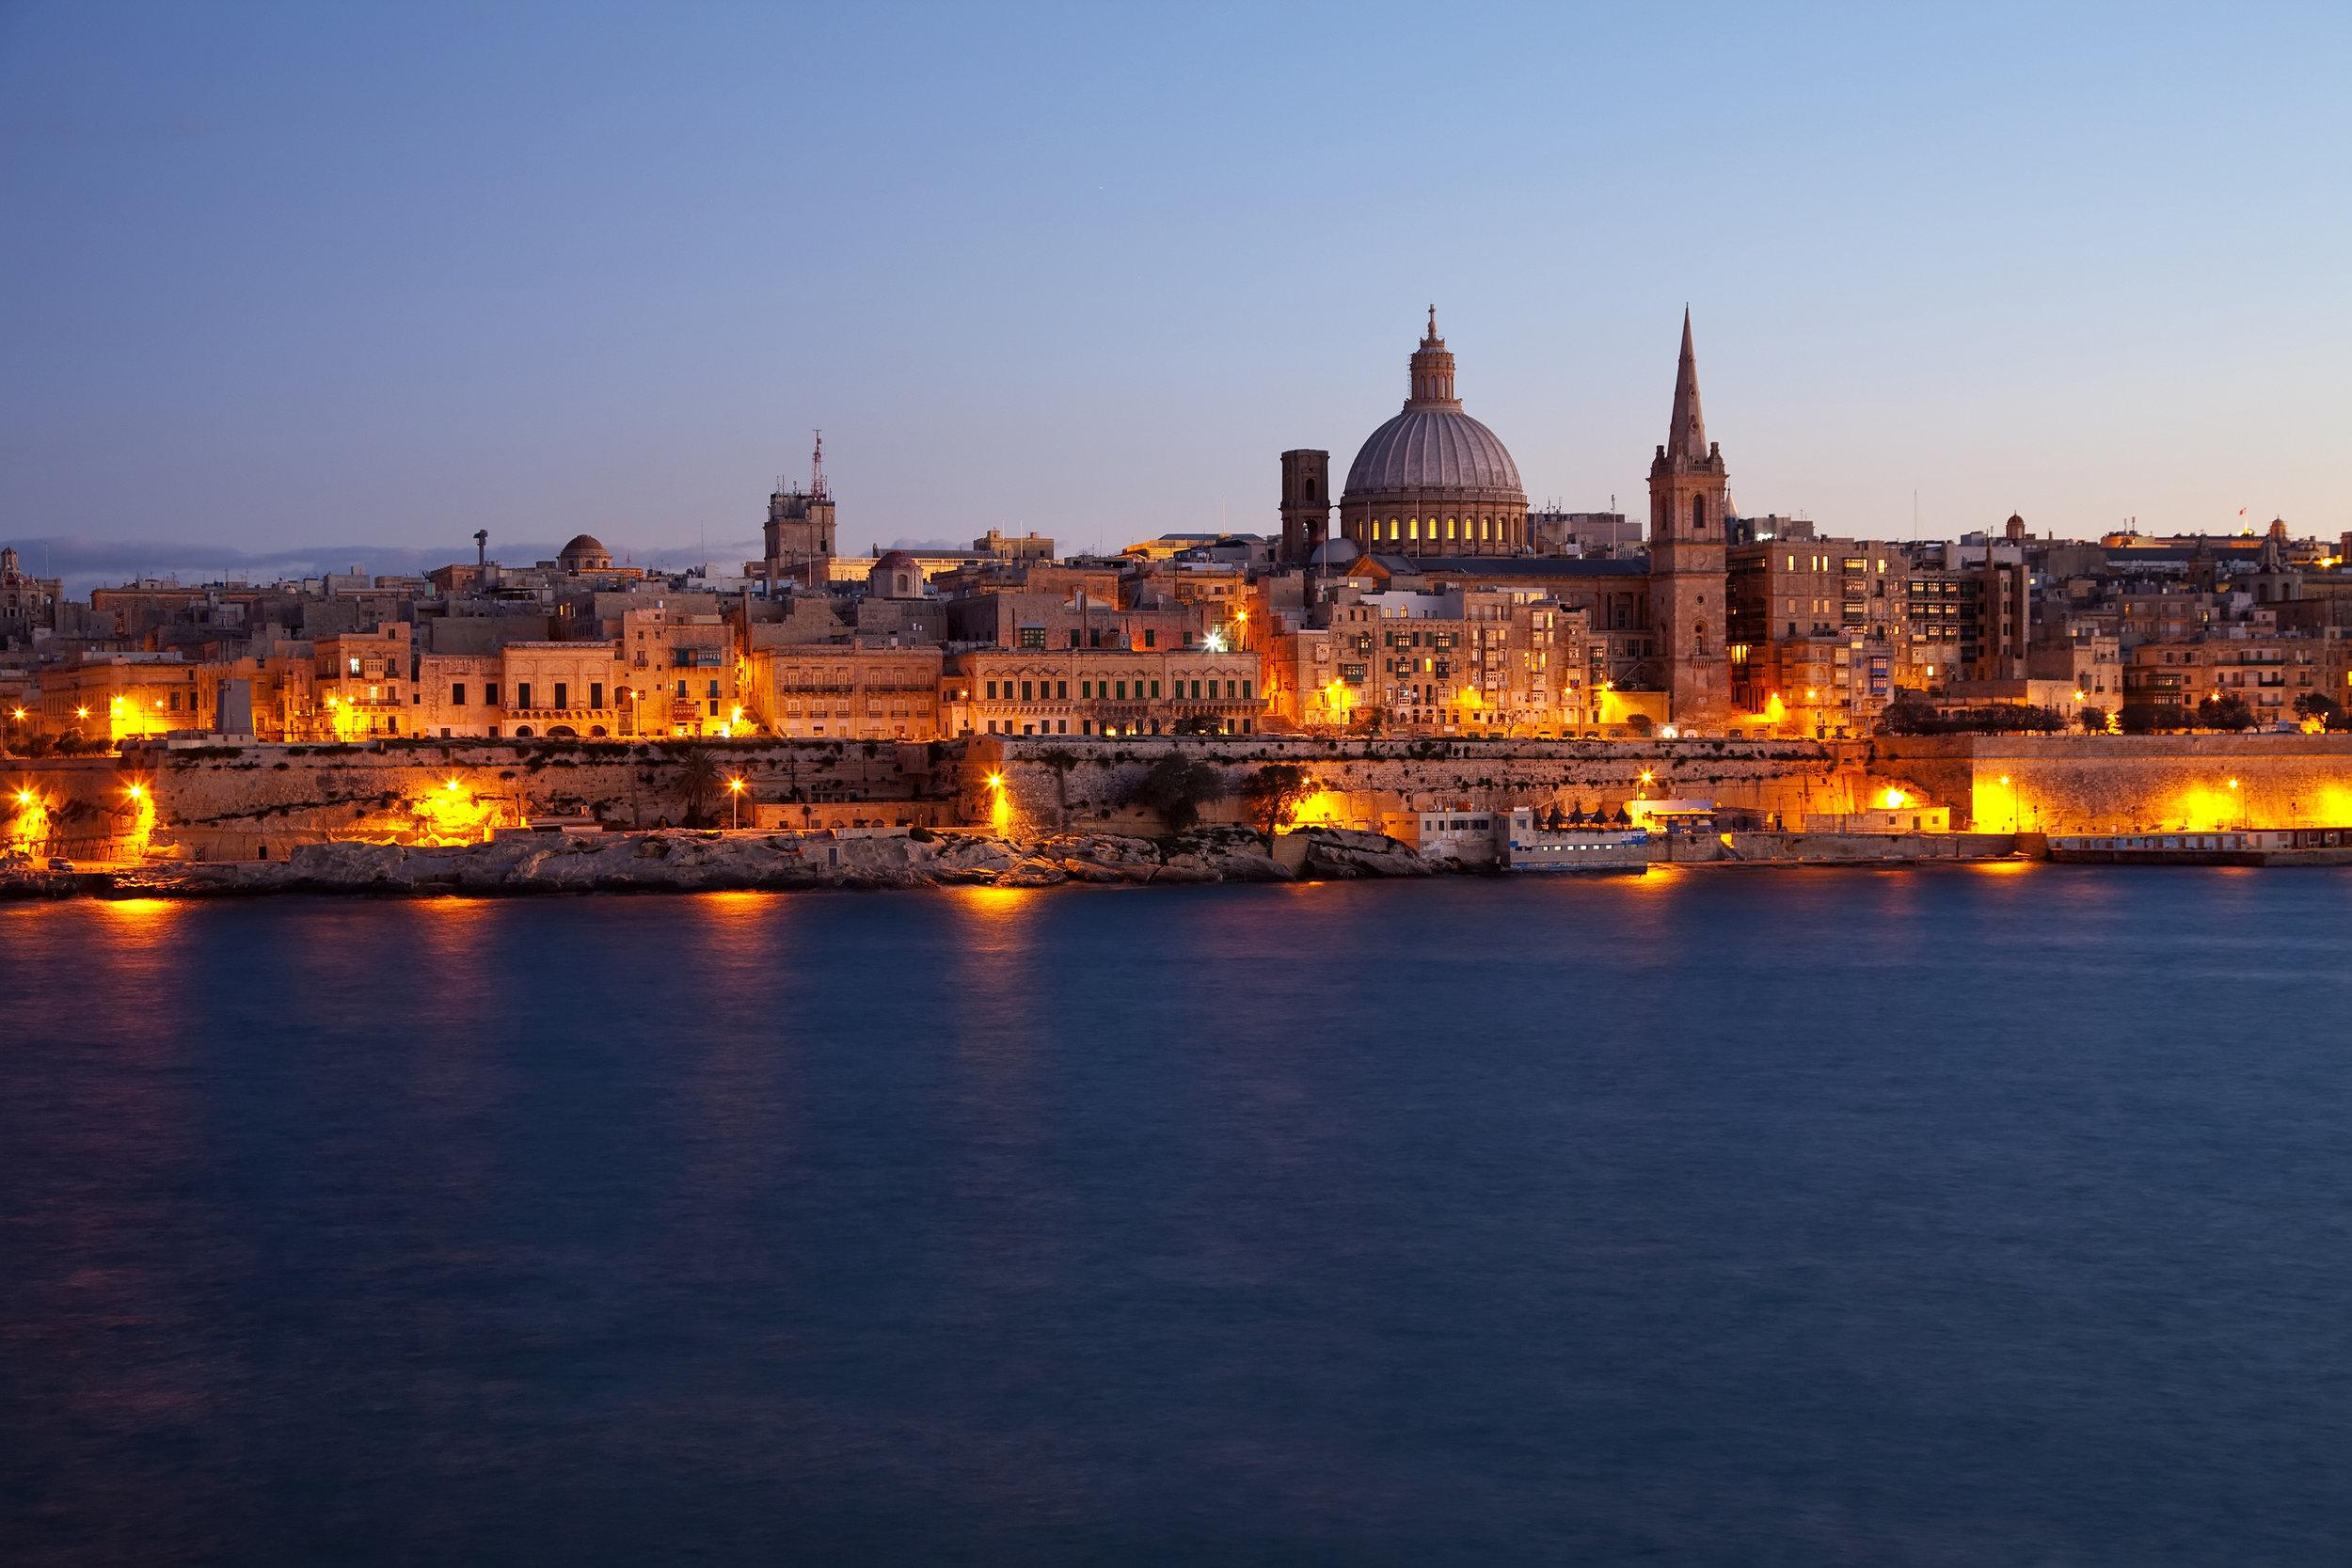 malta_valletta_bigstock-Old-Valletta-In-Dusk-13048004.jpg